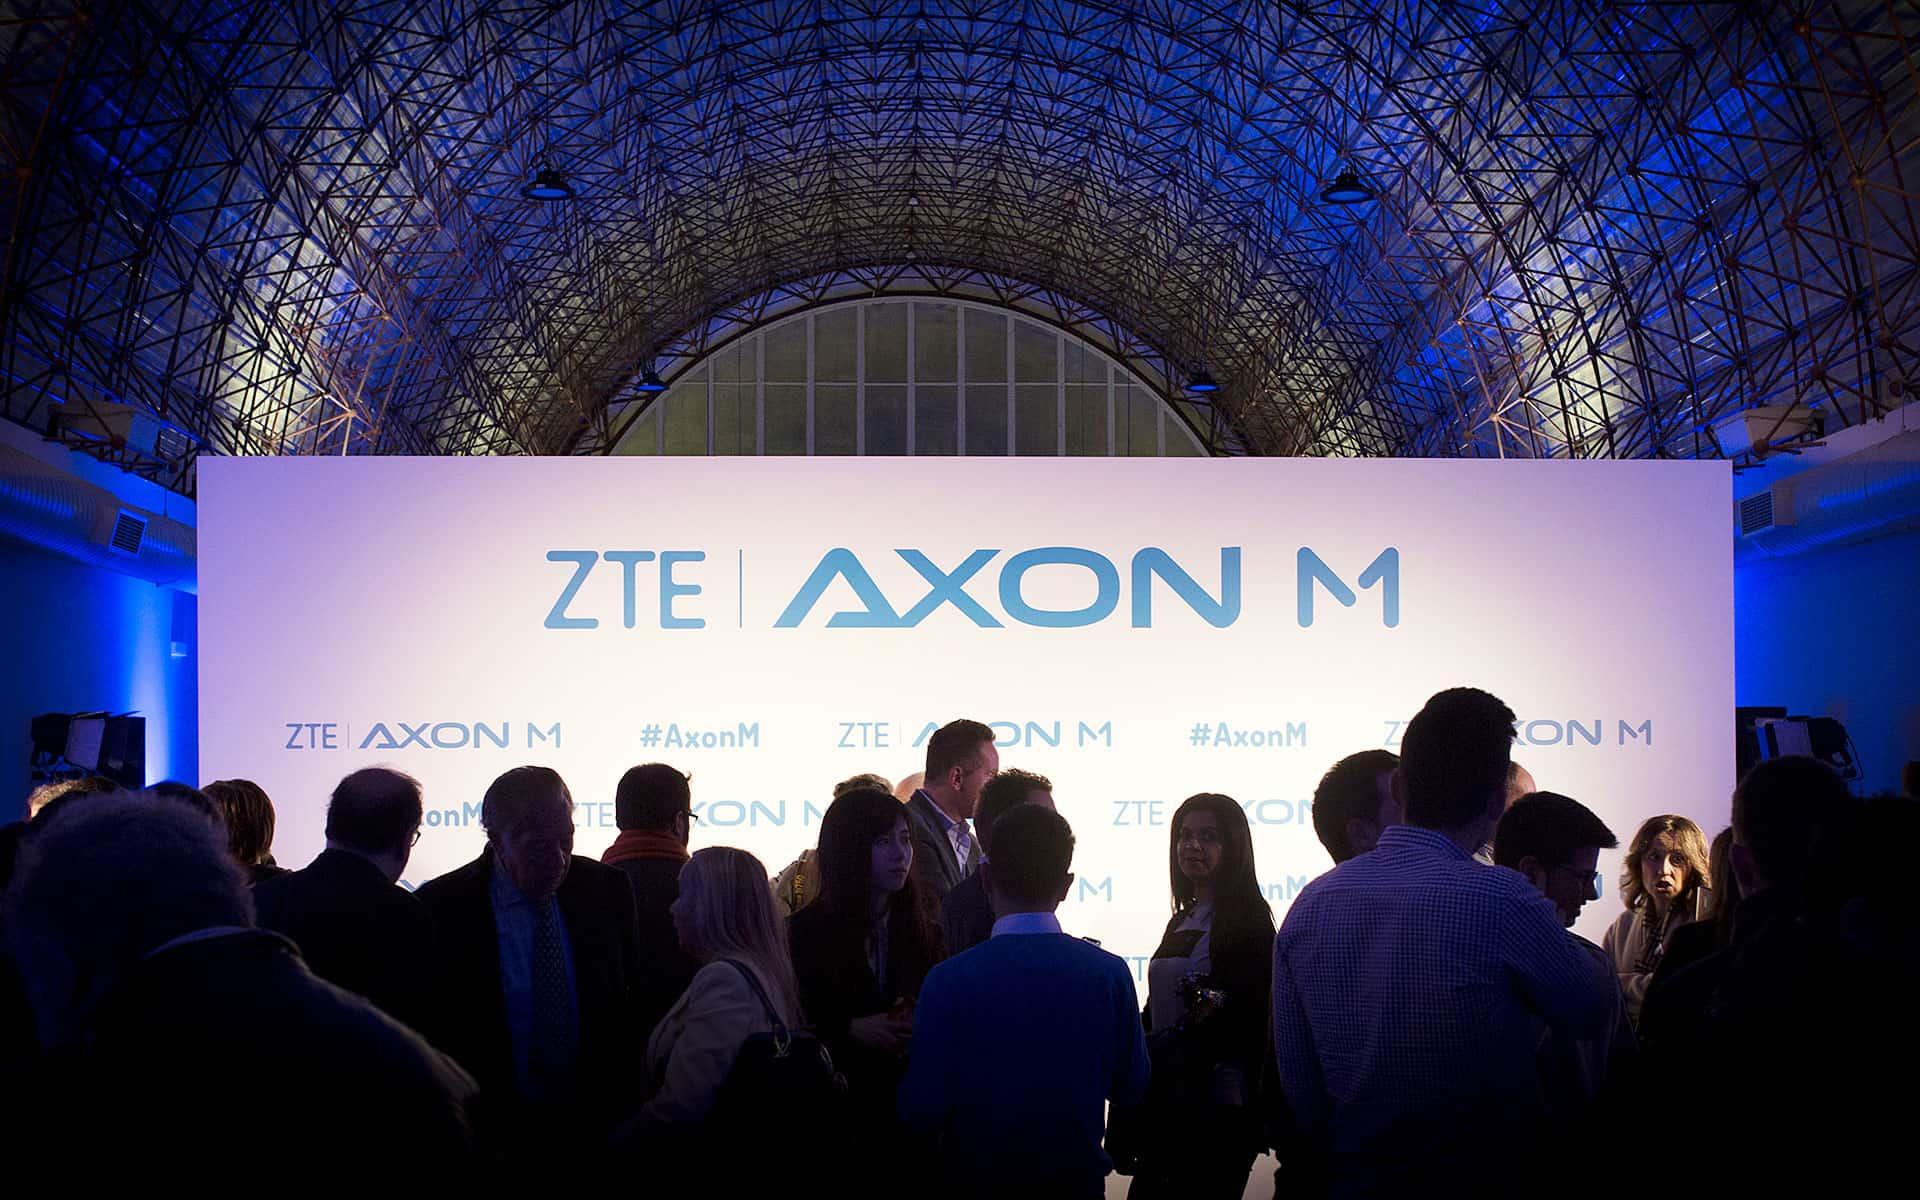 Agencia COONIC   Presentación AXON M 2018 DE ZTE   Salas MEEU